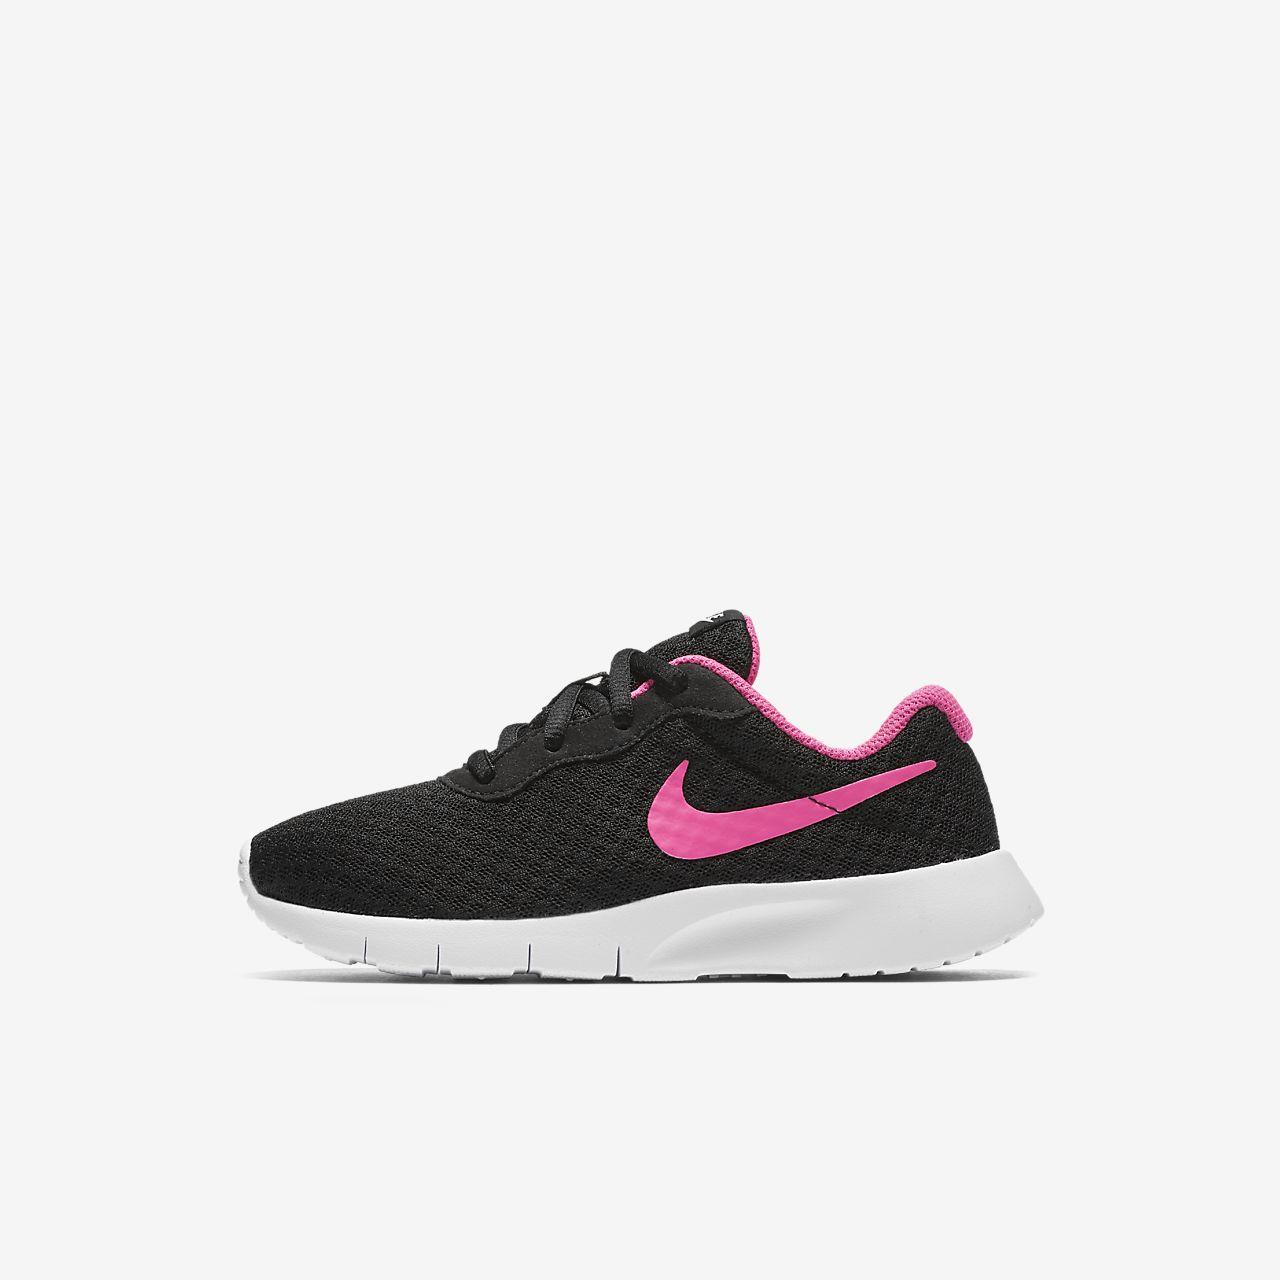 Nike Tanjun-sko til små børn